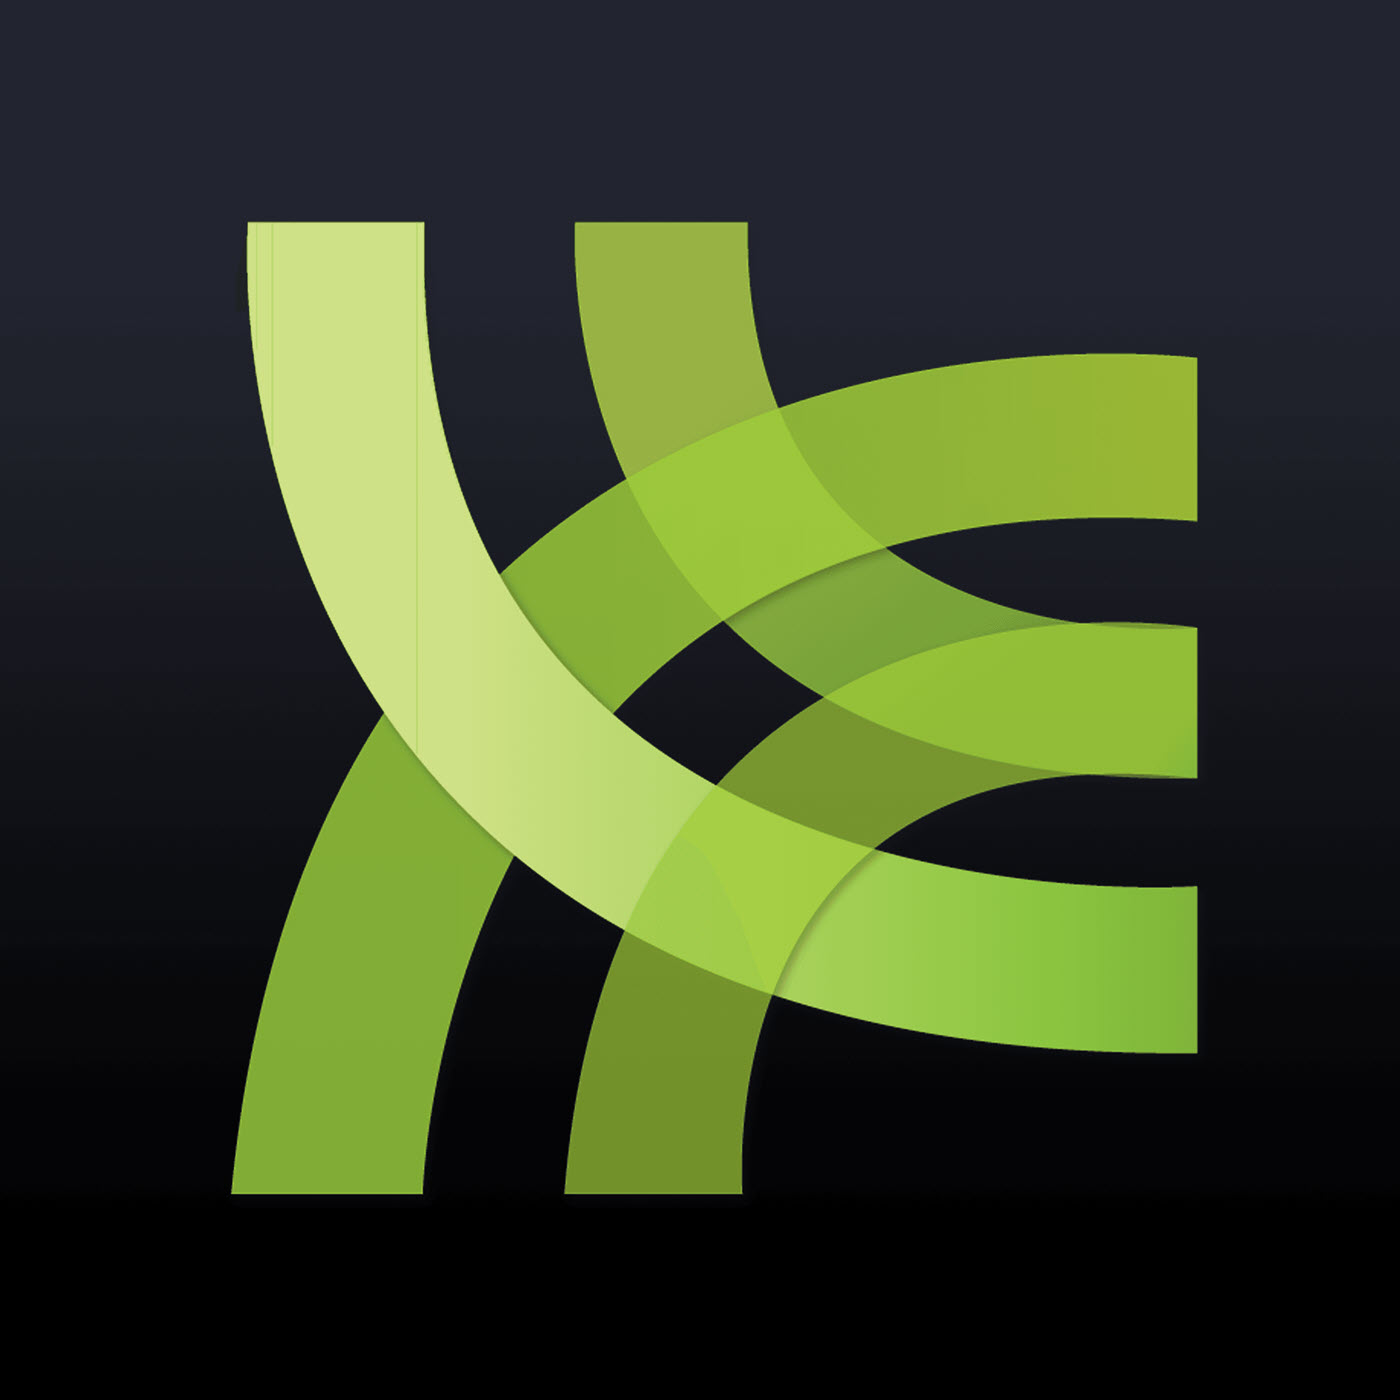 http://homedir-c.libsyn.com/podcasts/6979c5e7258166c182891fb65fd4c0b4/4ba60d31/chilicheesedogradio/images/banksy-hilton-07.jpg